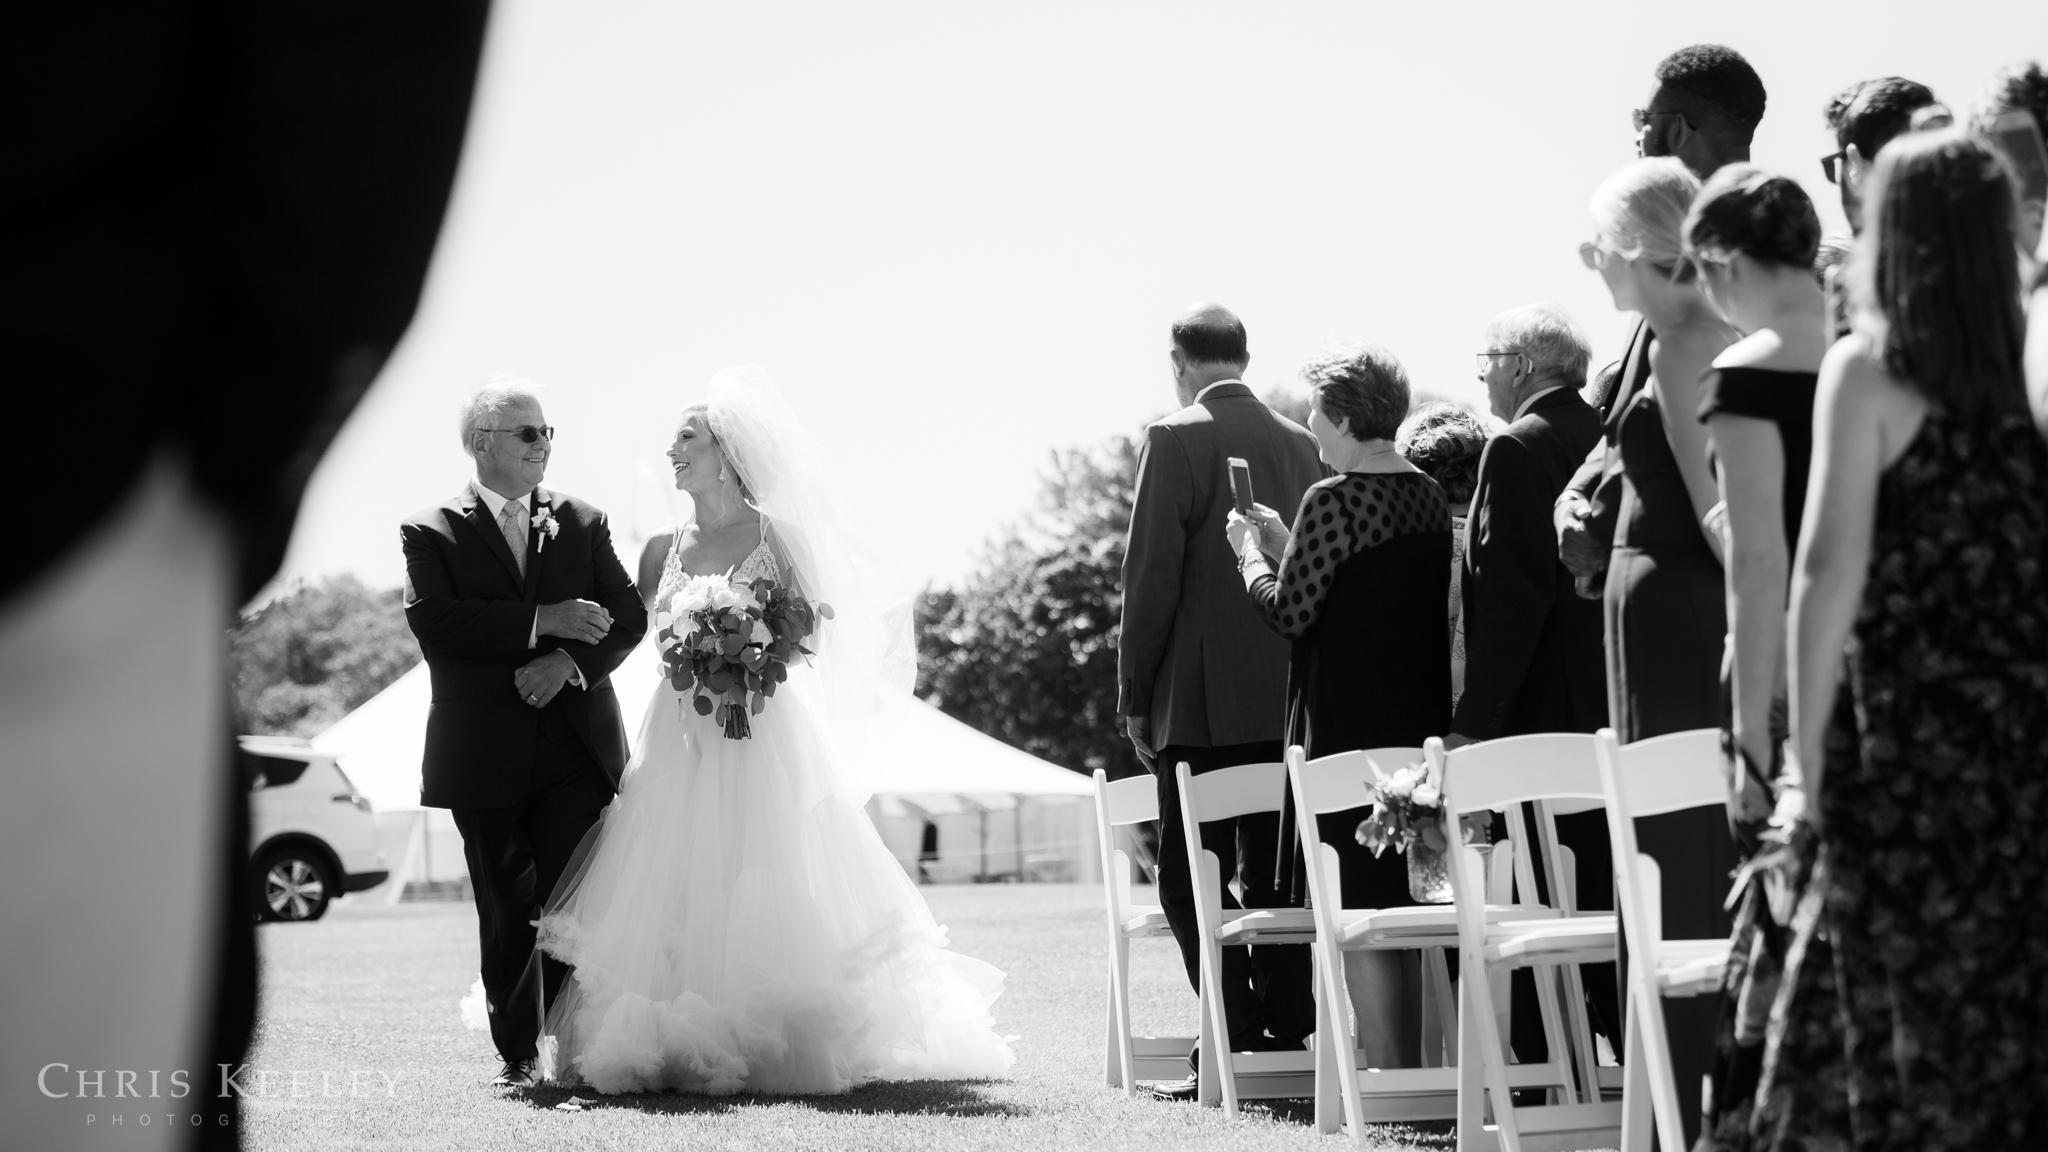 wentworth-portsmouth-new-hampshire-wedding-photographer-48.jpg